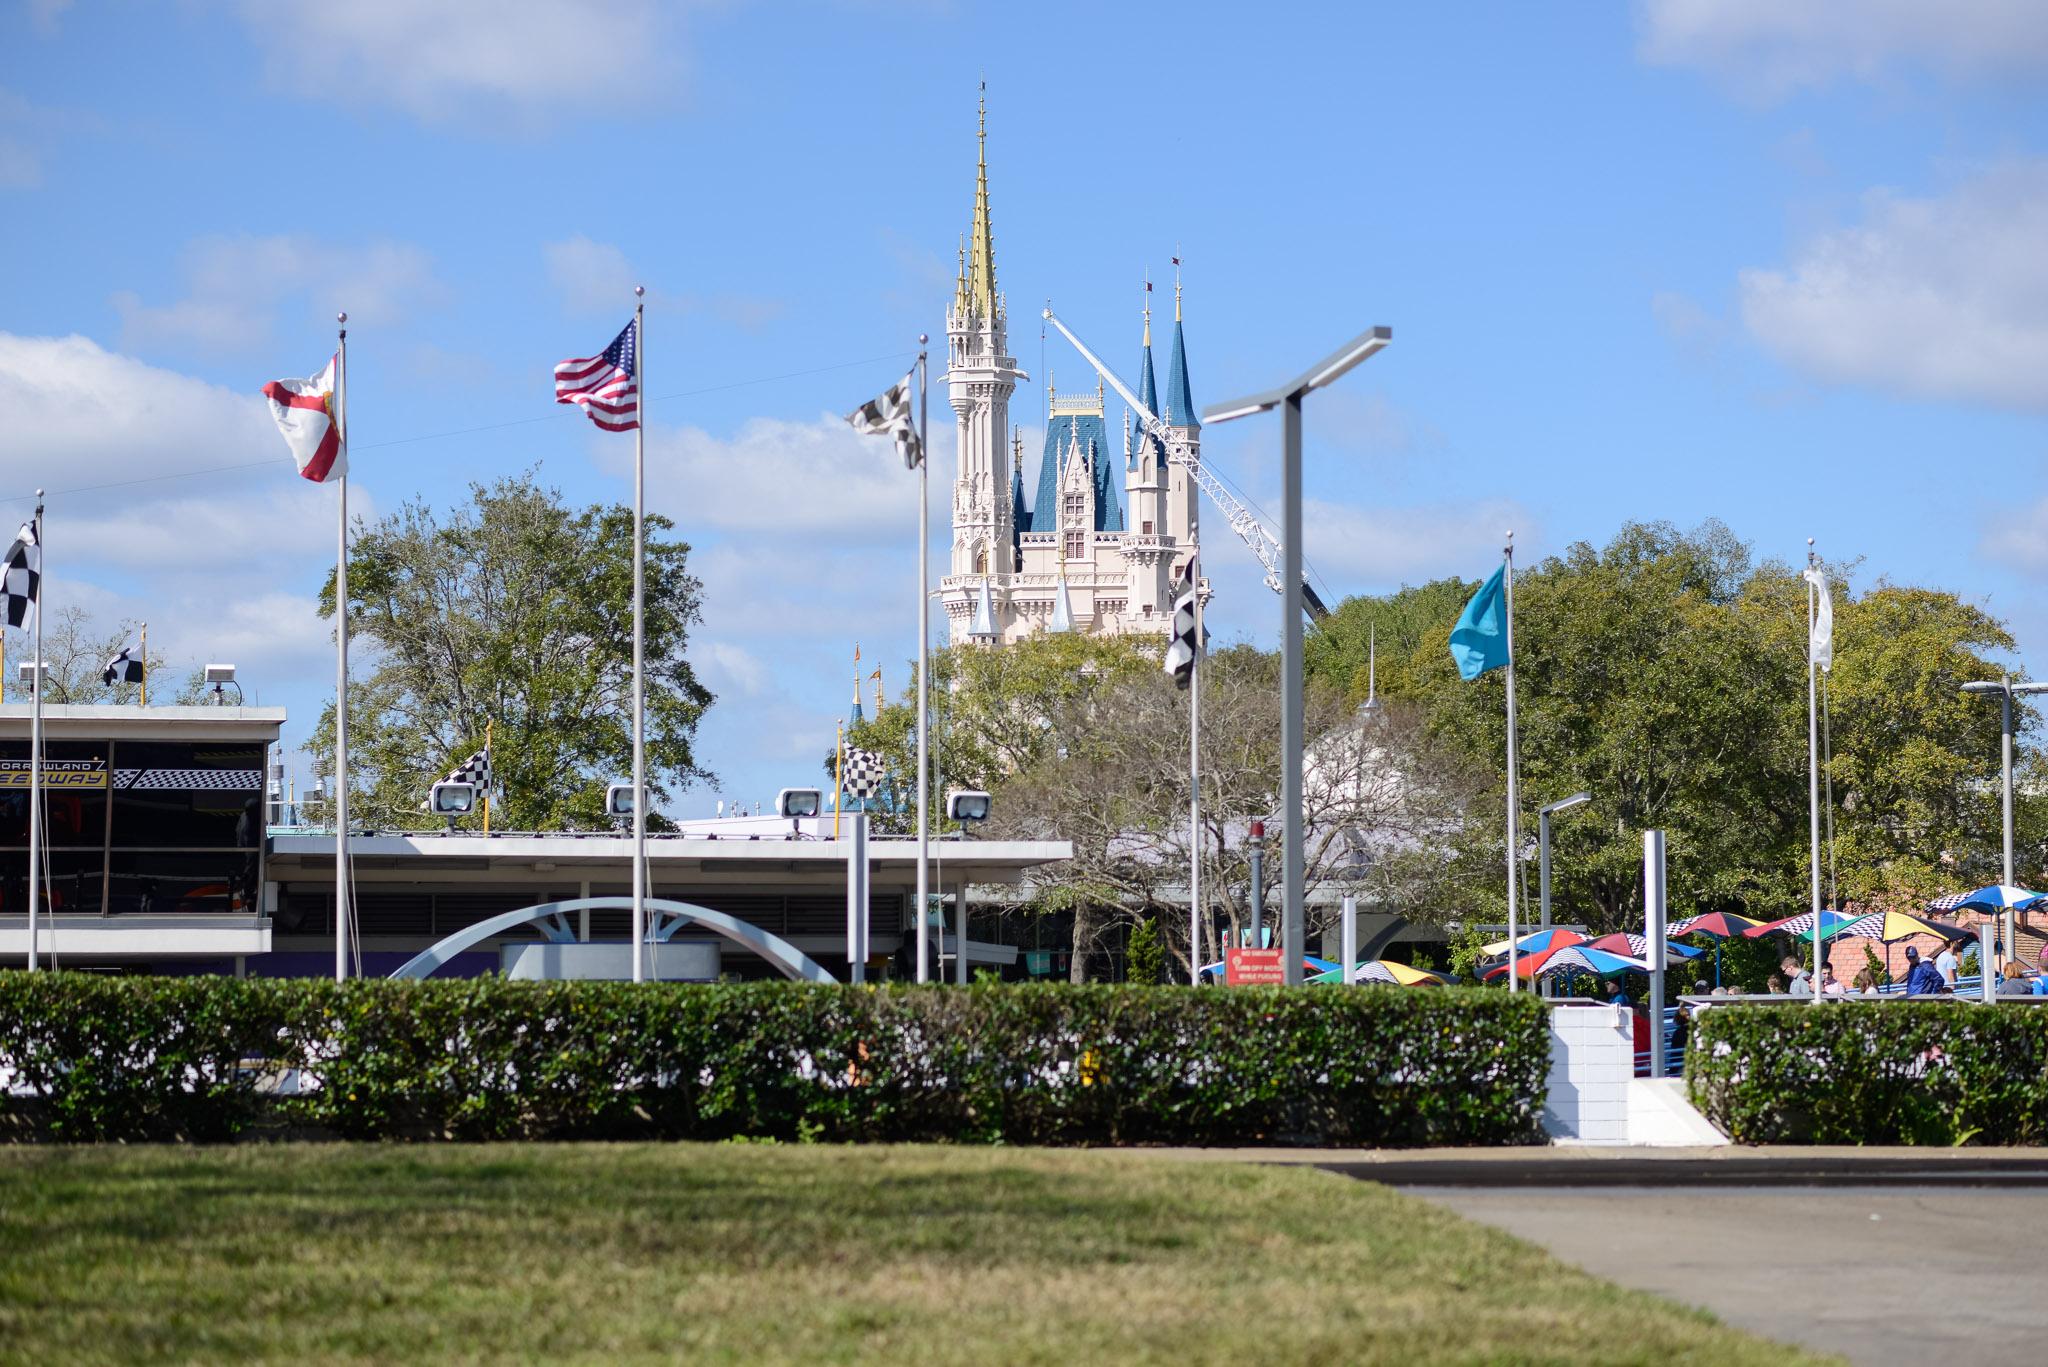 Cinderella Castle from Speedway - Walt Disney World Magic Kingdom